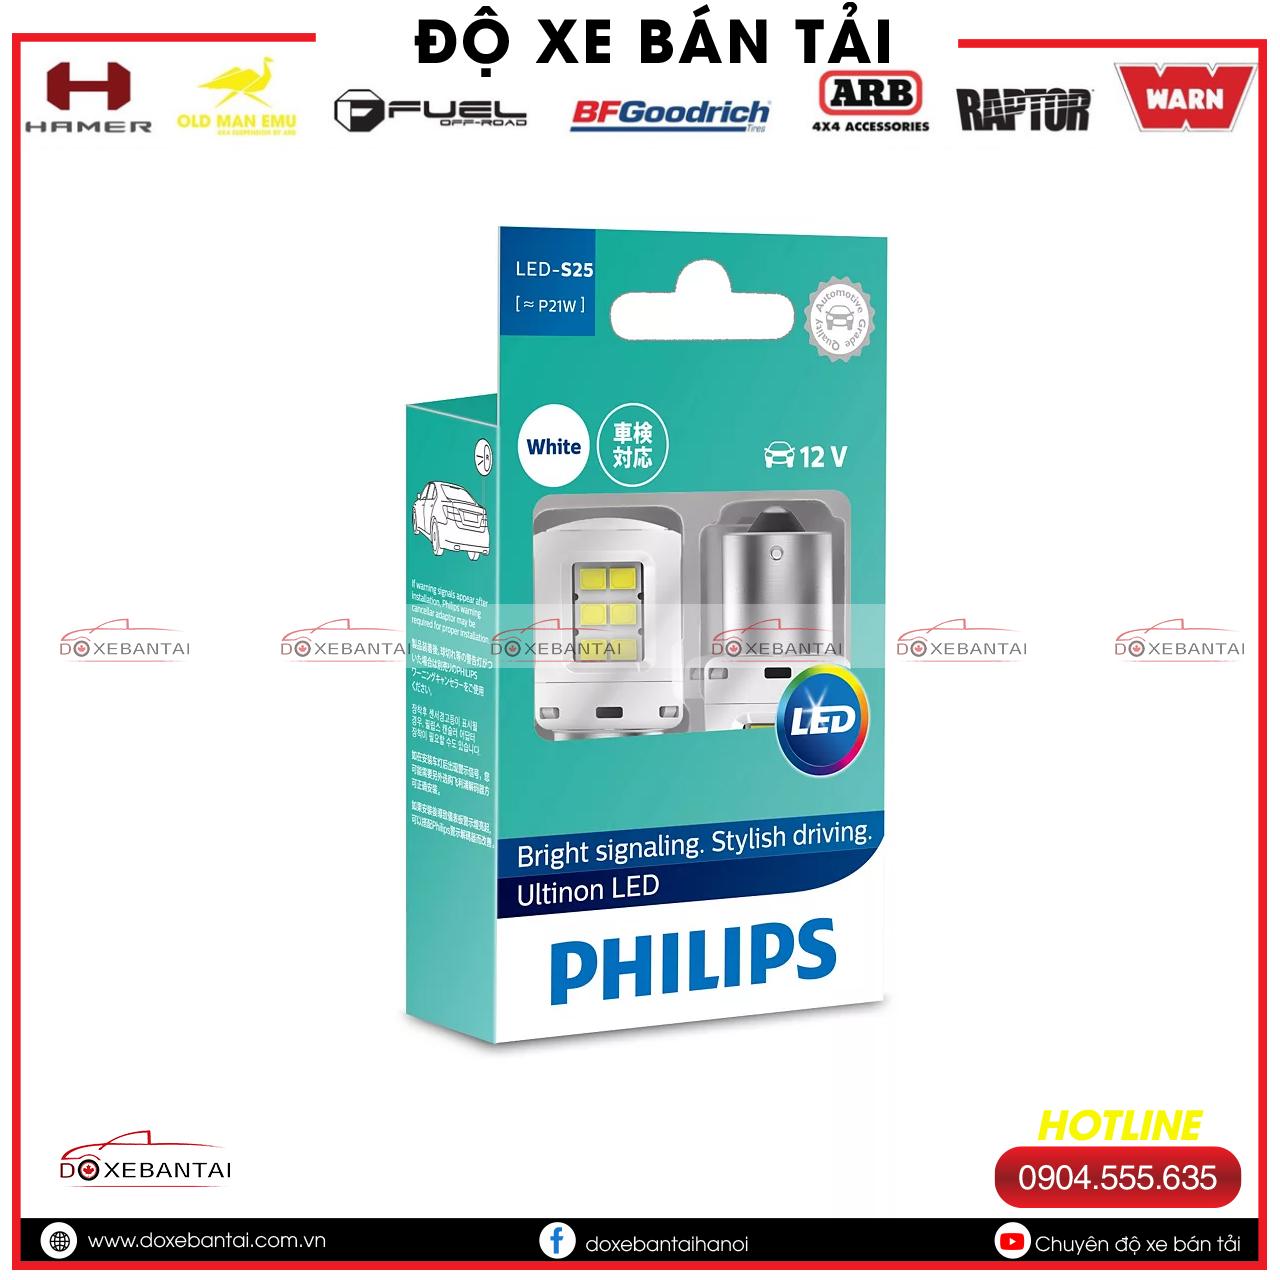 Bong-den-P21W-Philips-Ultinon-LED-cuong-do-cao-2.jpg